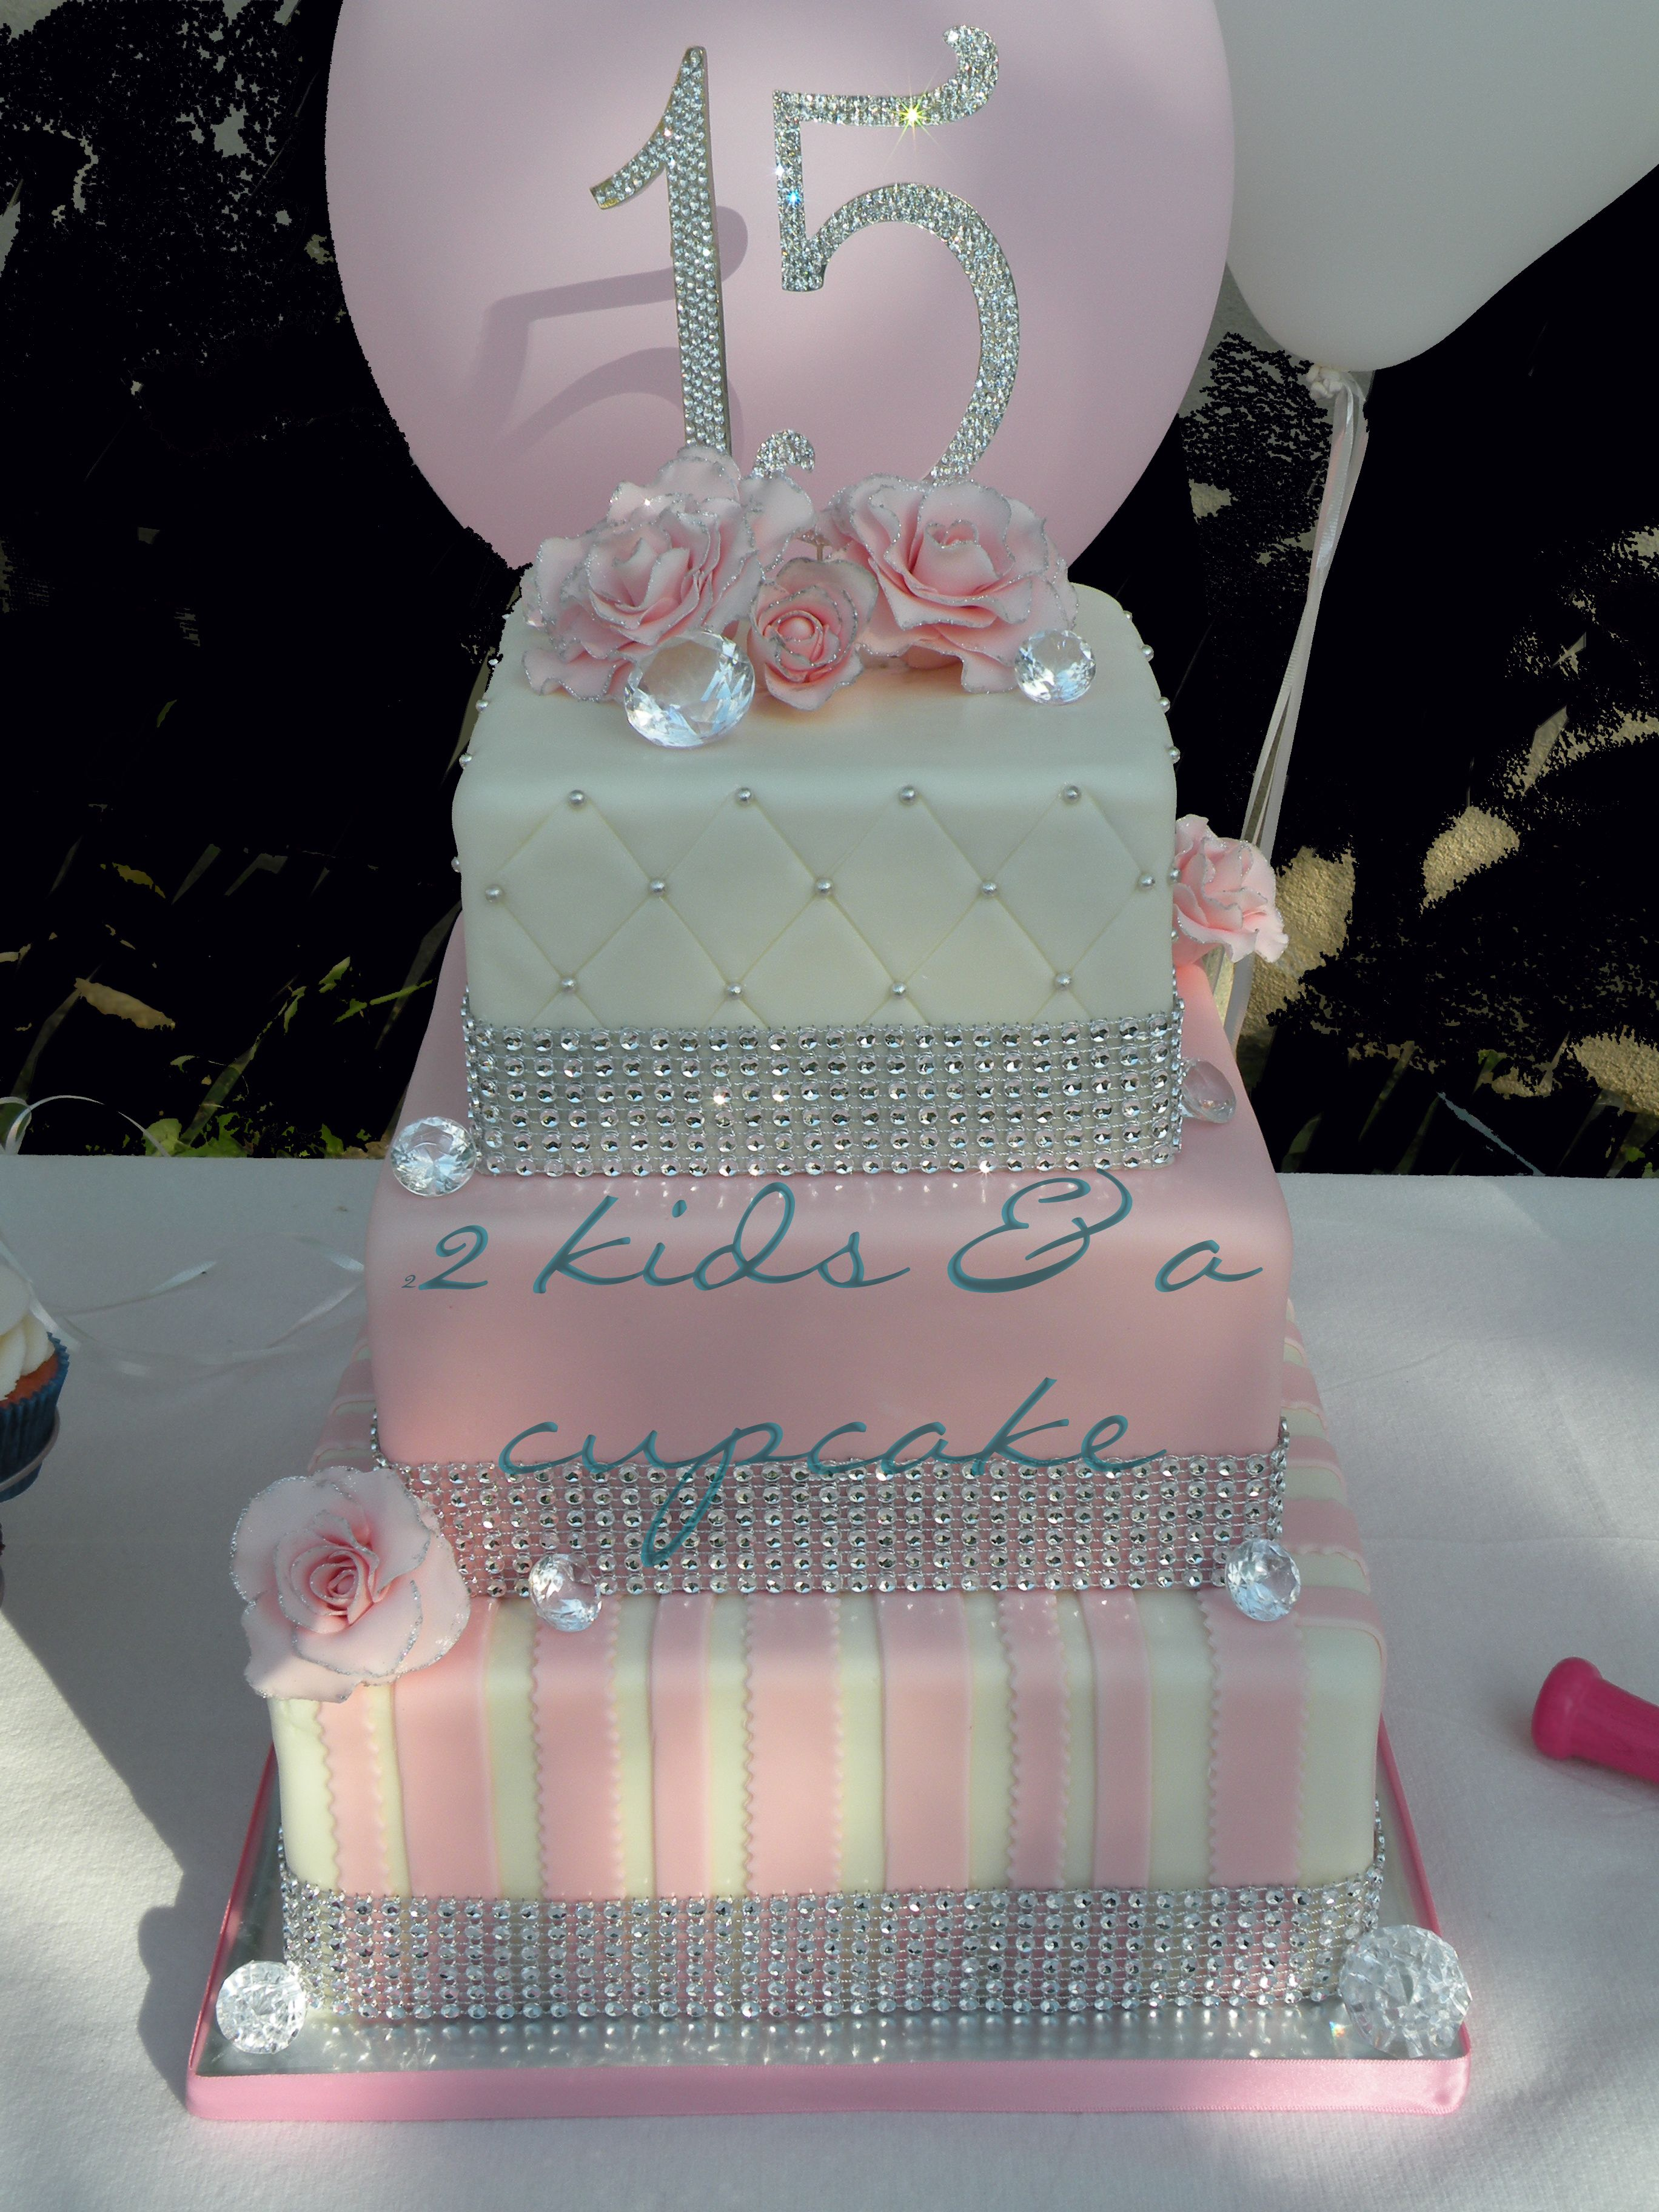 quinceanera cake  - #Quinceanera #Quincedress #Misquince #cake #beautiful #cute #QbyDavinci